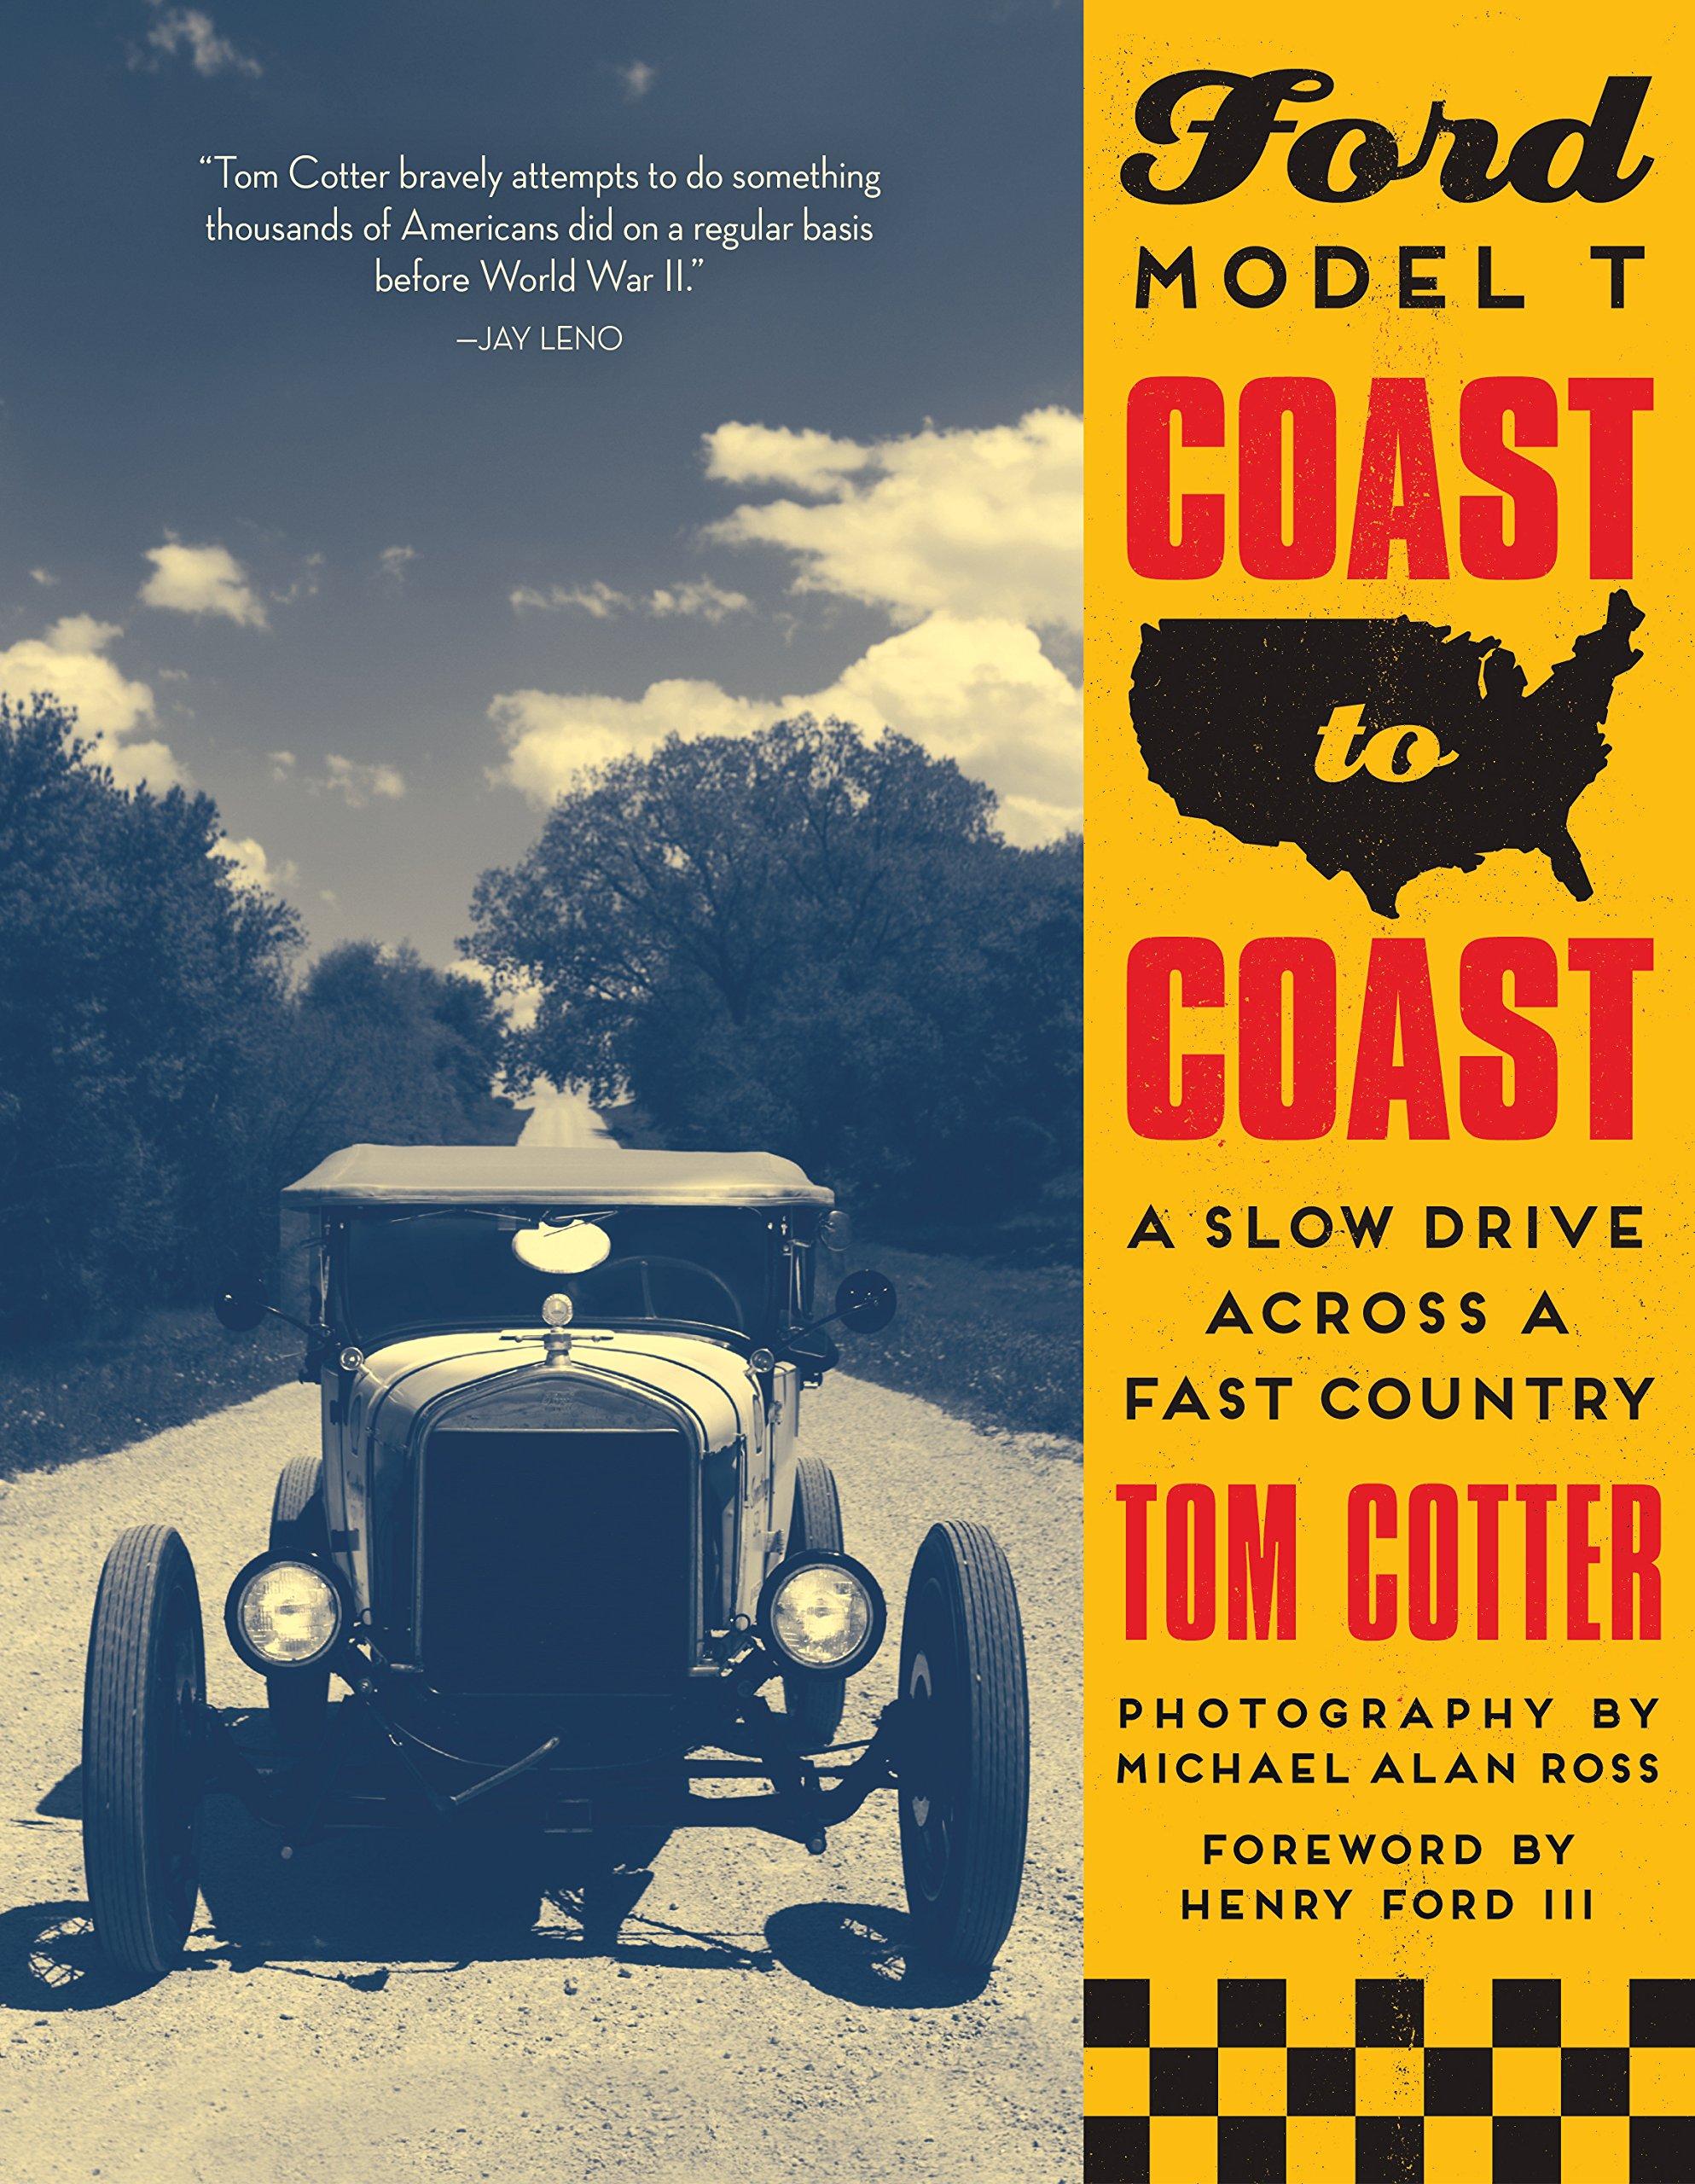 Ford Model T Coast to Coast: A Slow Drive across a Fast